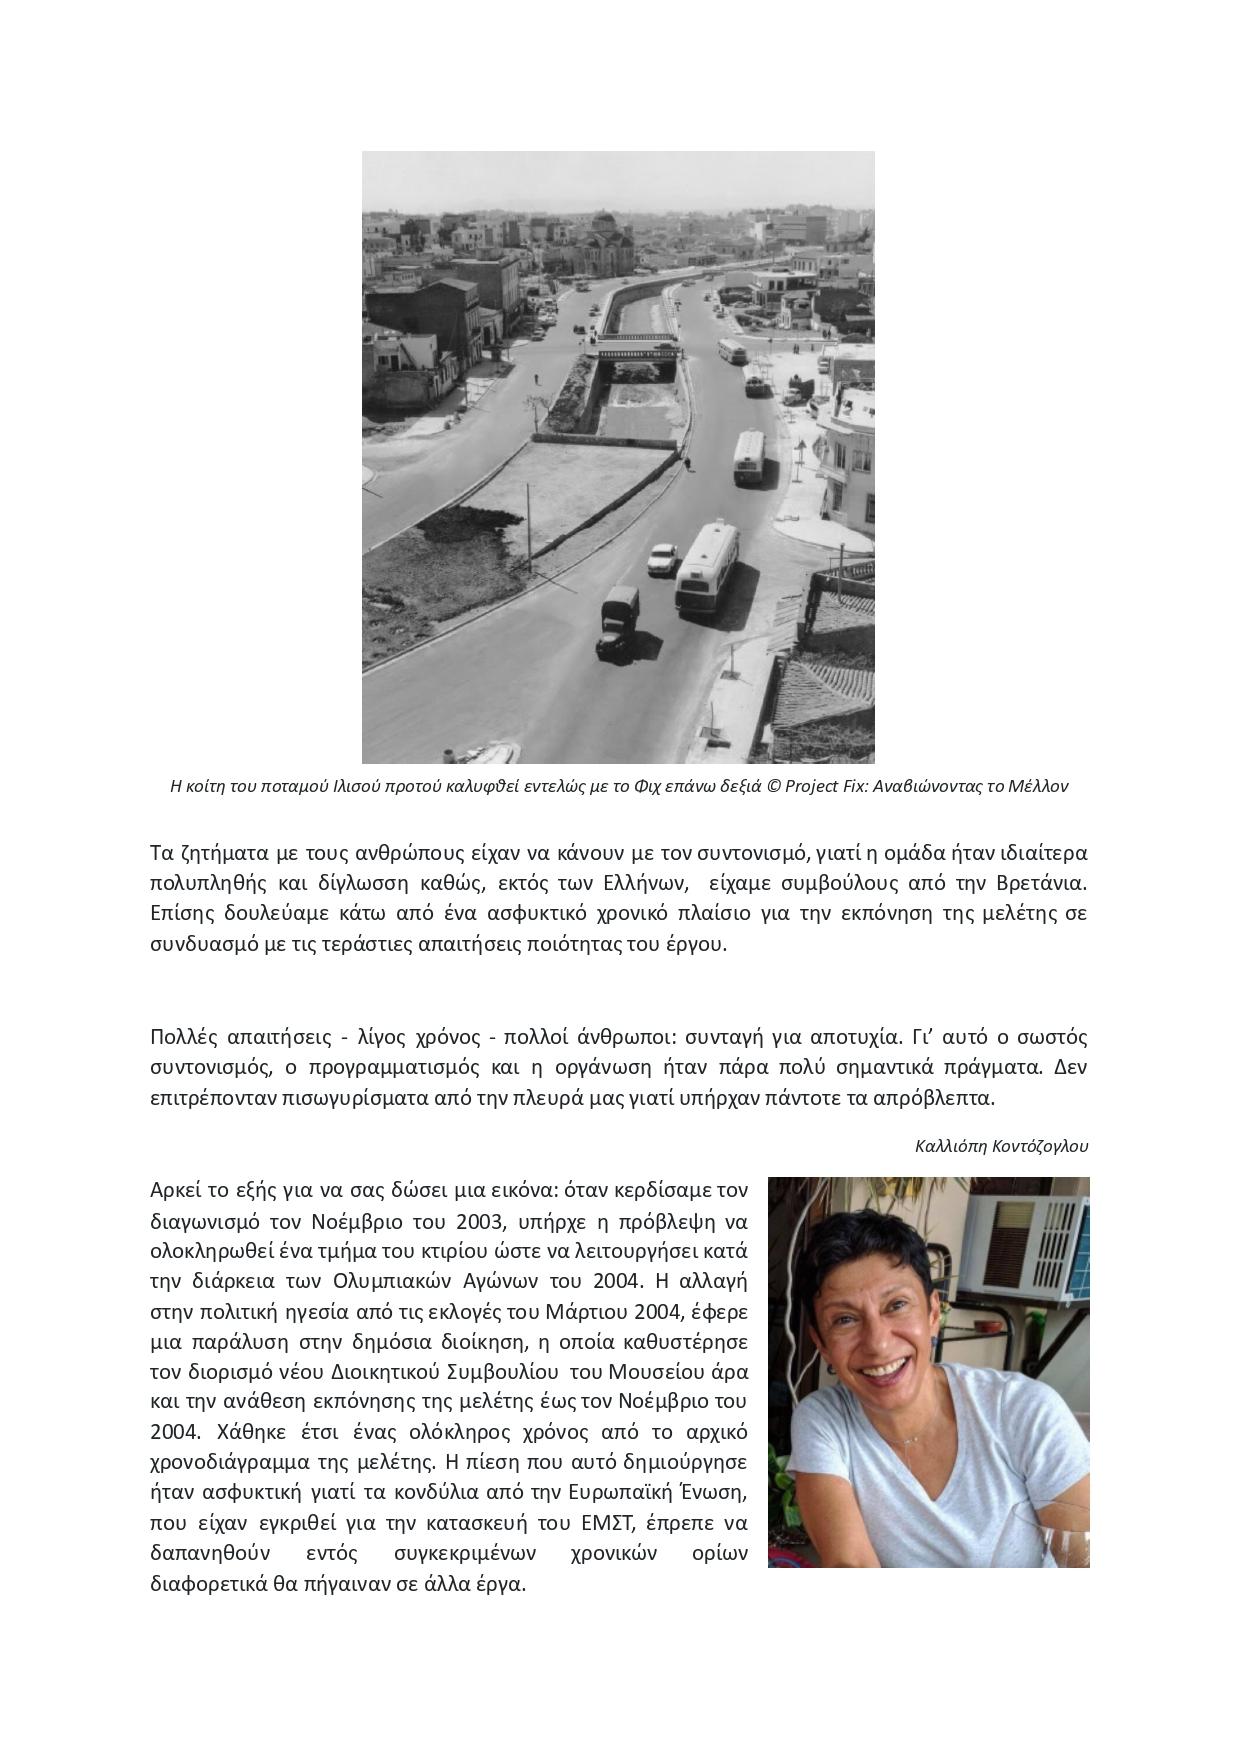 AthensVoice Kalliope Kontozoglou.docx - Google Docs_page-0003